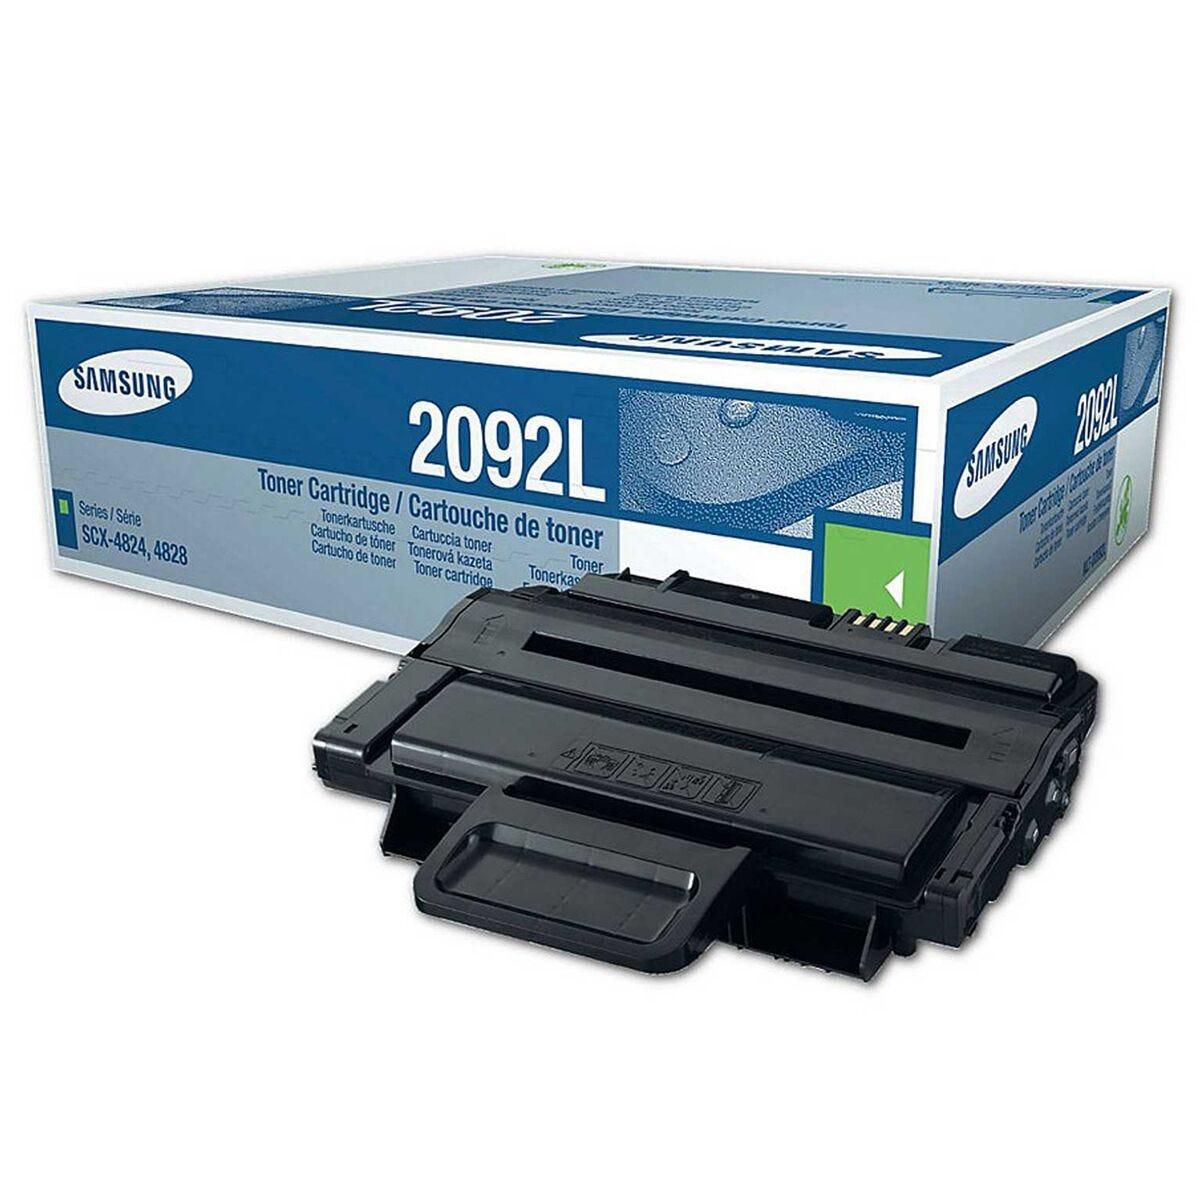 Samsung MLT D2092L High capacity Ink  Printer Toner Cartridge